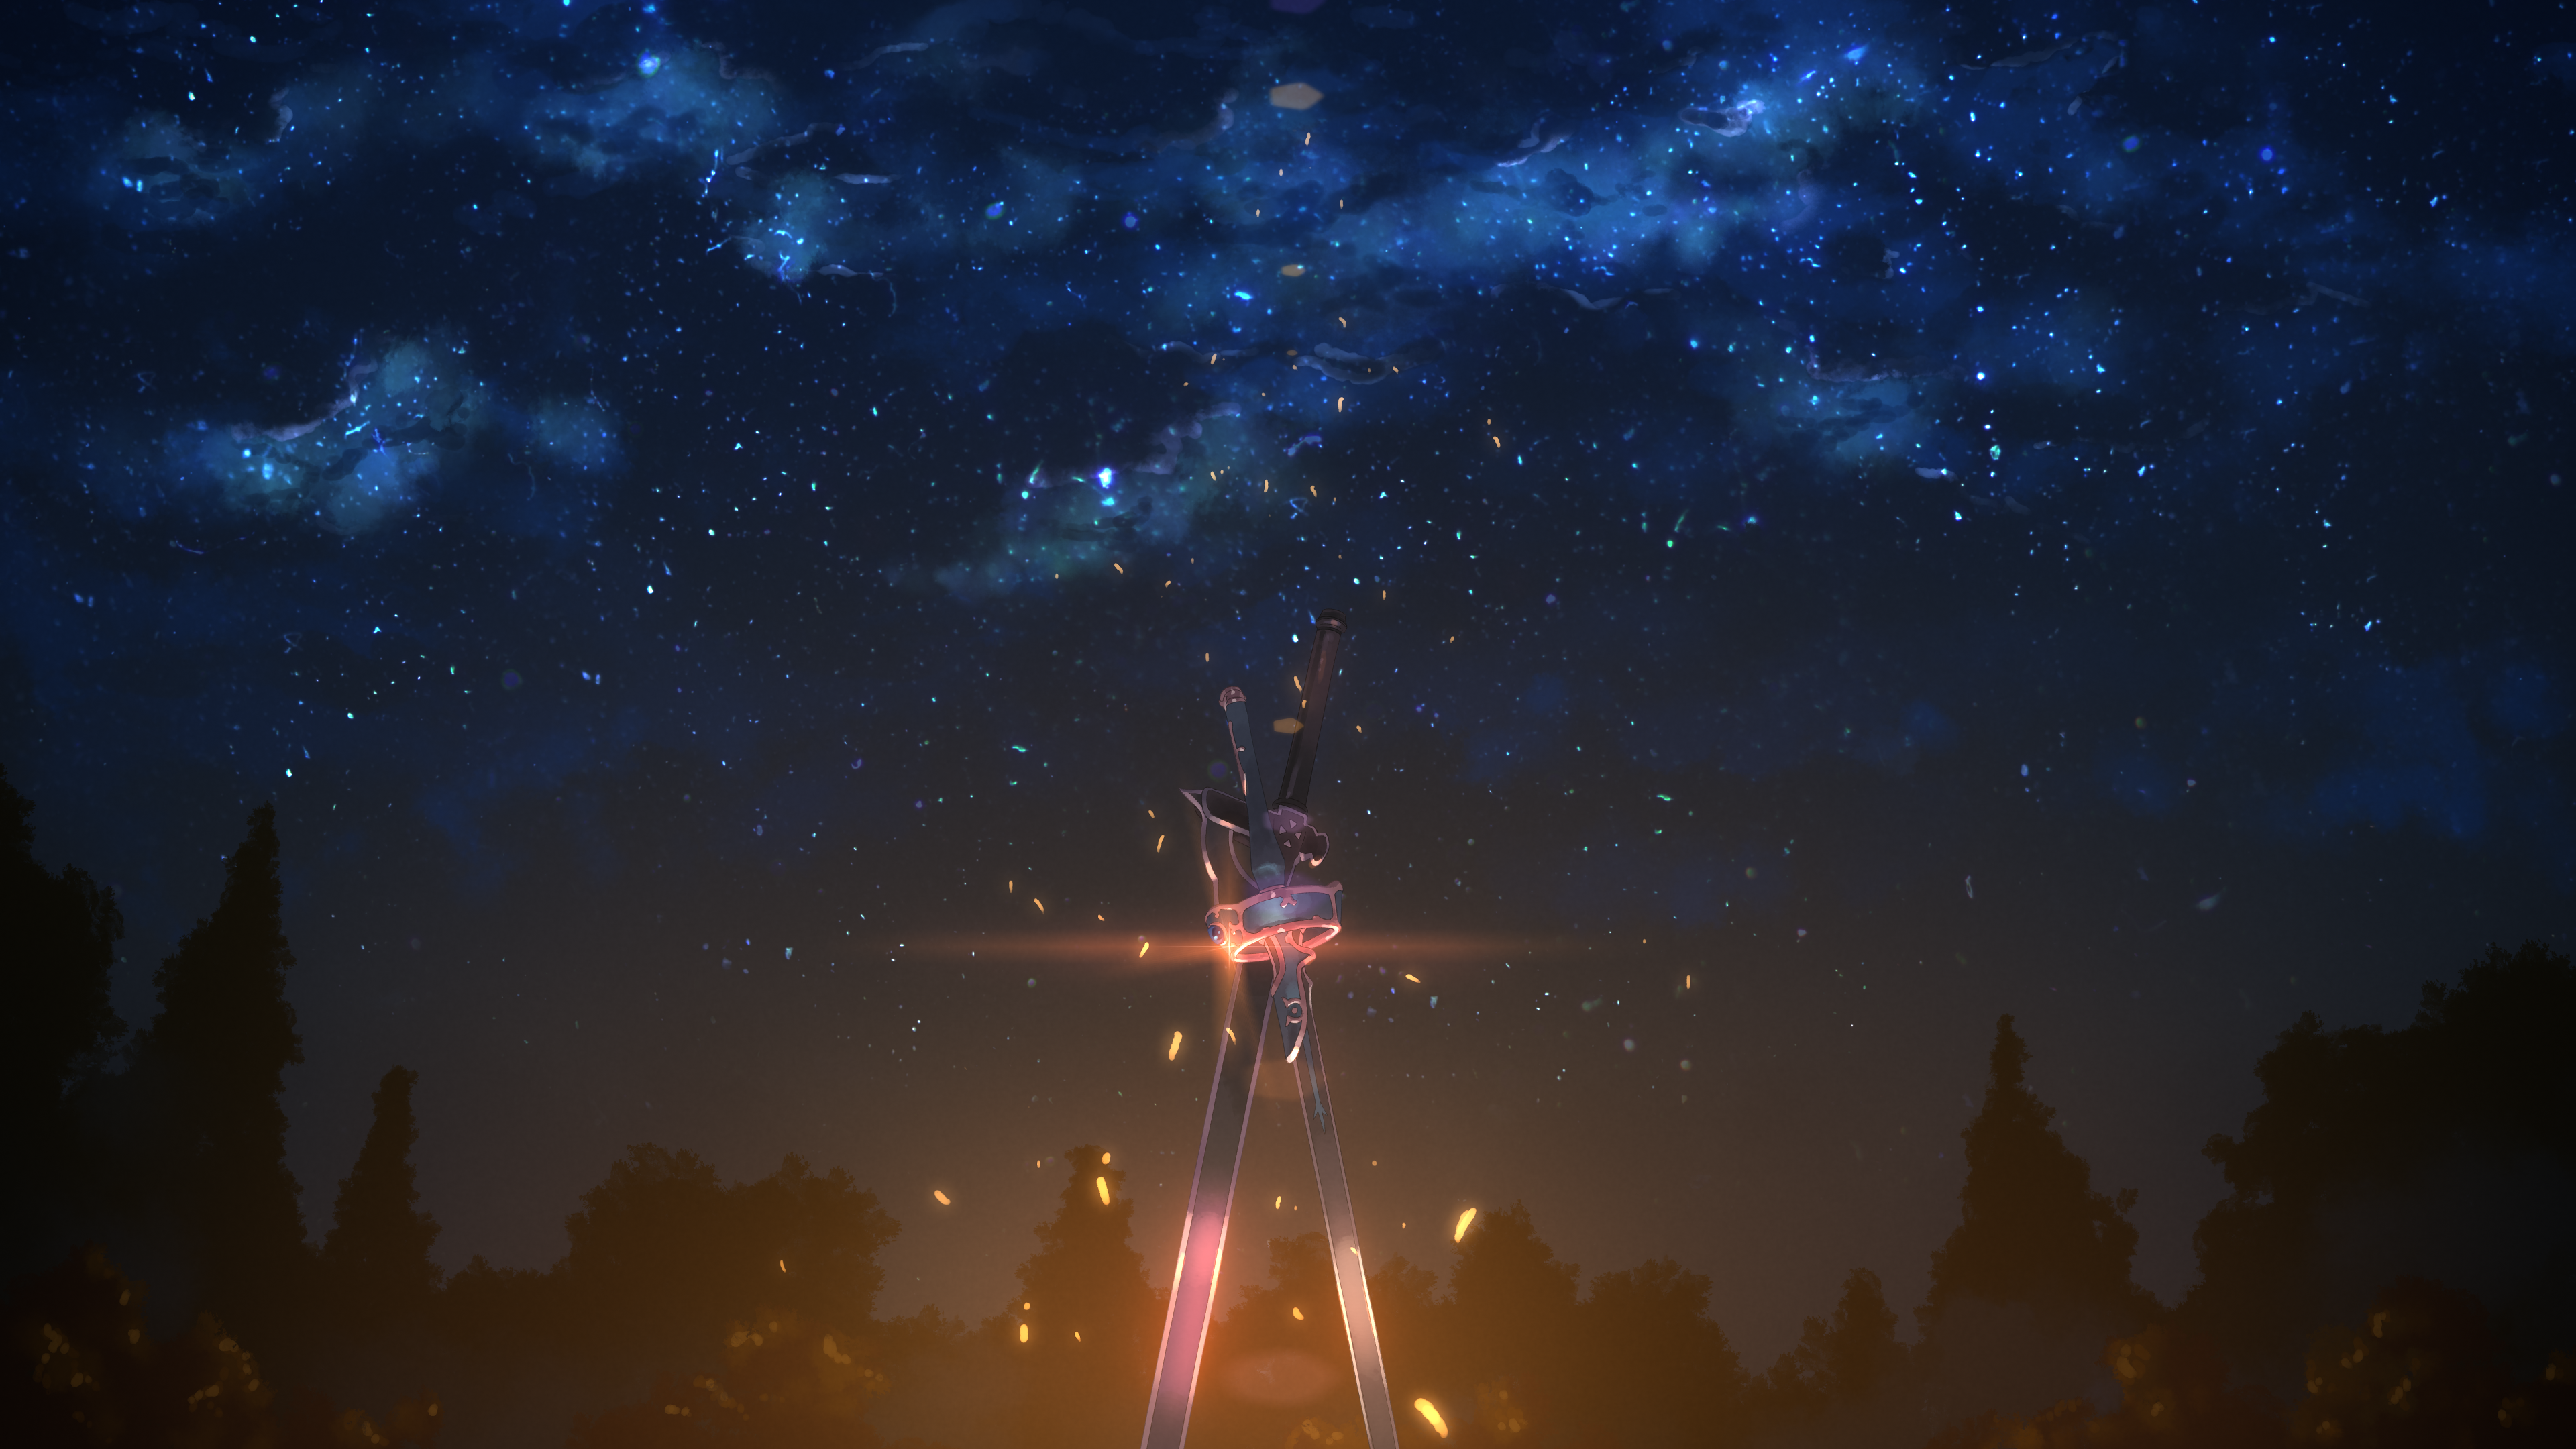 Kirito and Asuna\'s sword 4k Ultra HD Wallpaper.